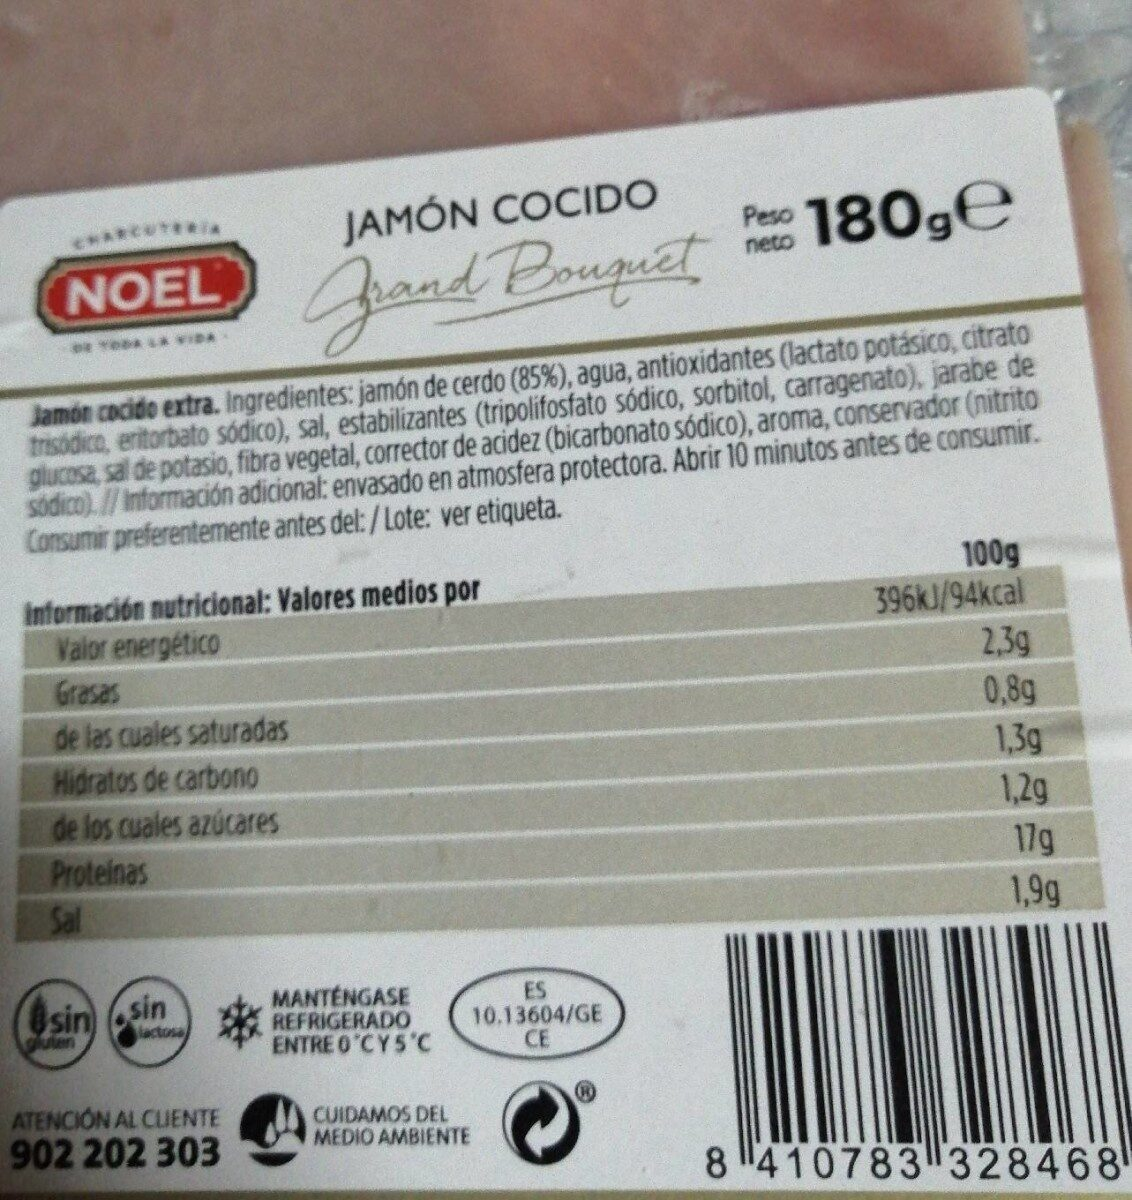 Grand bouquet jamon cocido extra - Información nutricional - fr